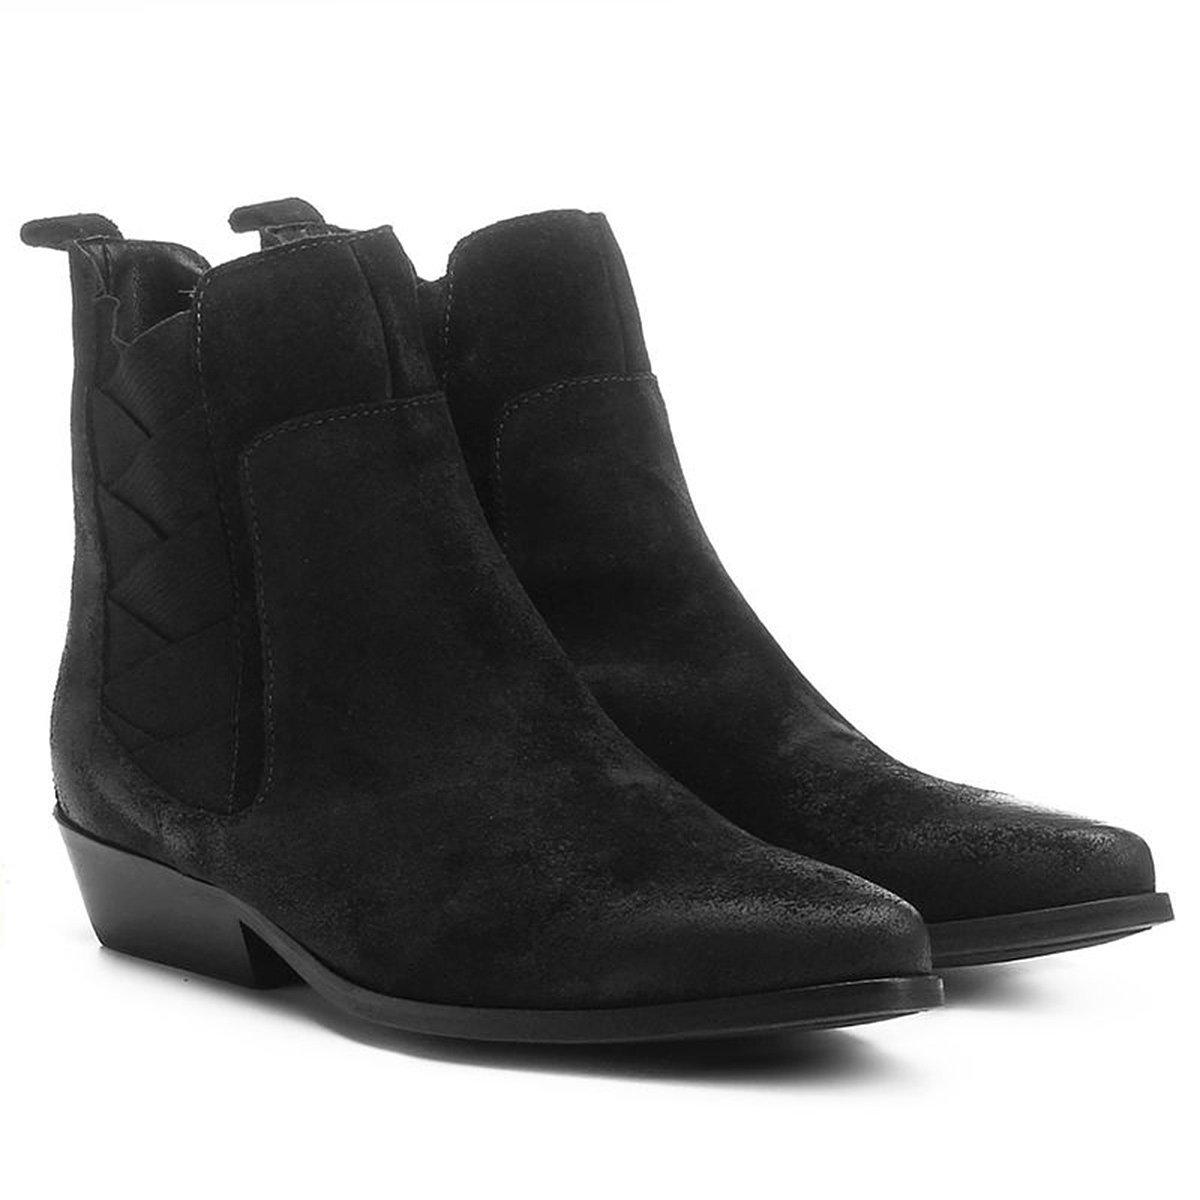 Elásticos Preto Bota Fino Shoestock Bico Transpassados Chelsea Couro Feminina XP6xZF